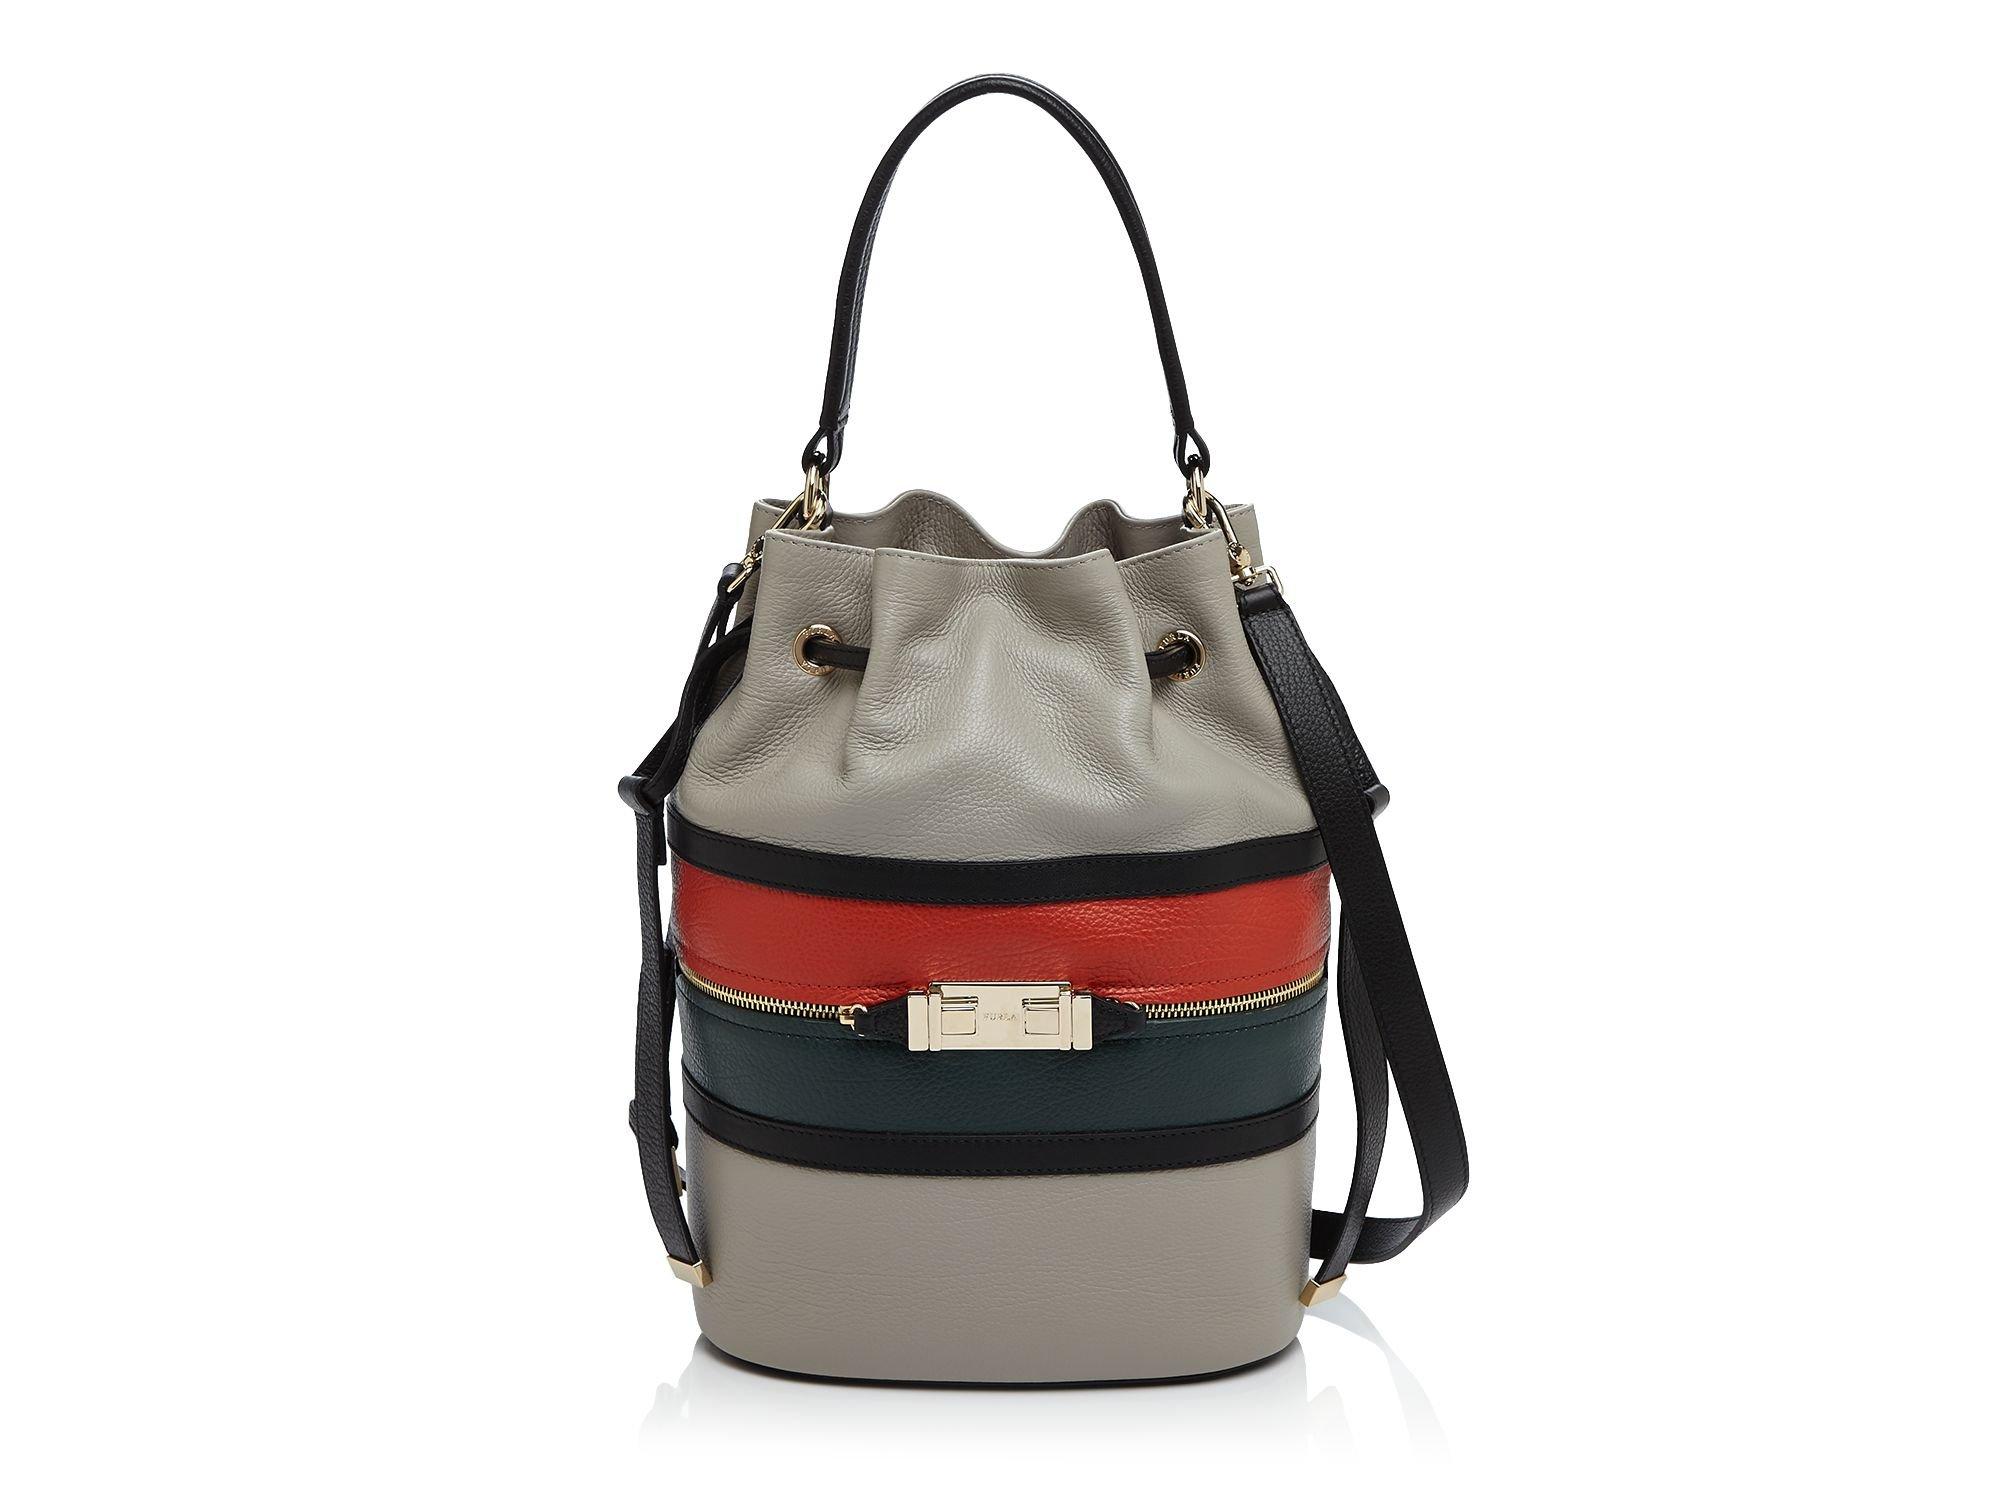 Statement Bag - AUTUMN CALLS BAG by VIDA VIDA R7ek8